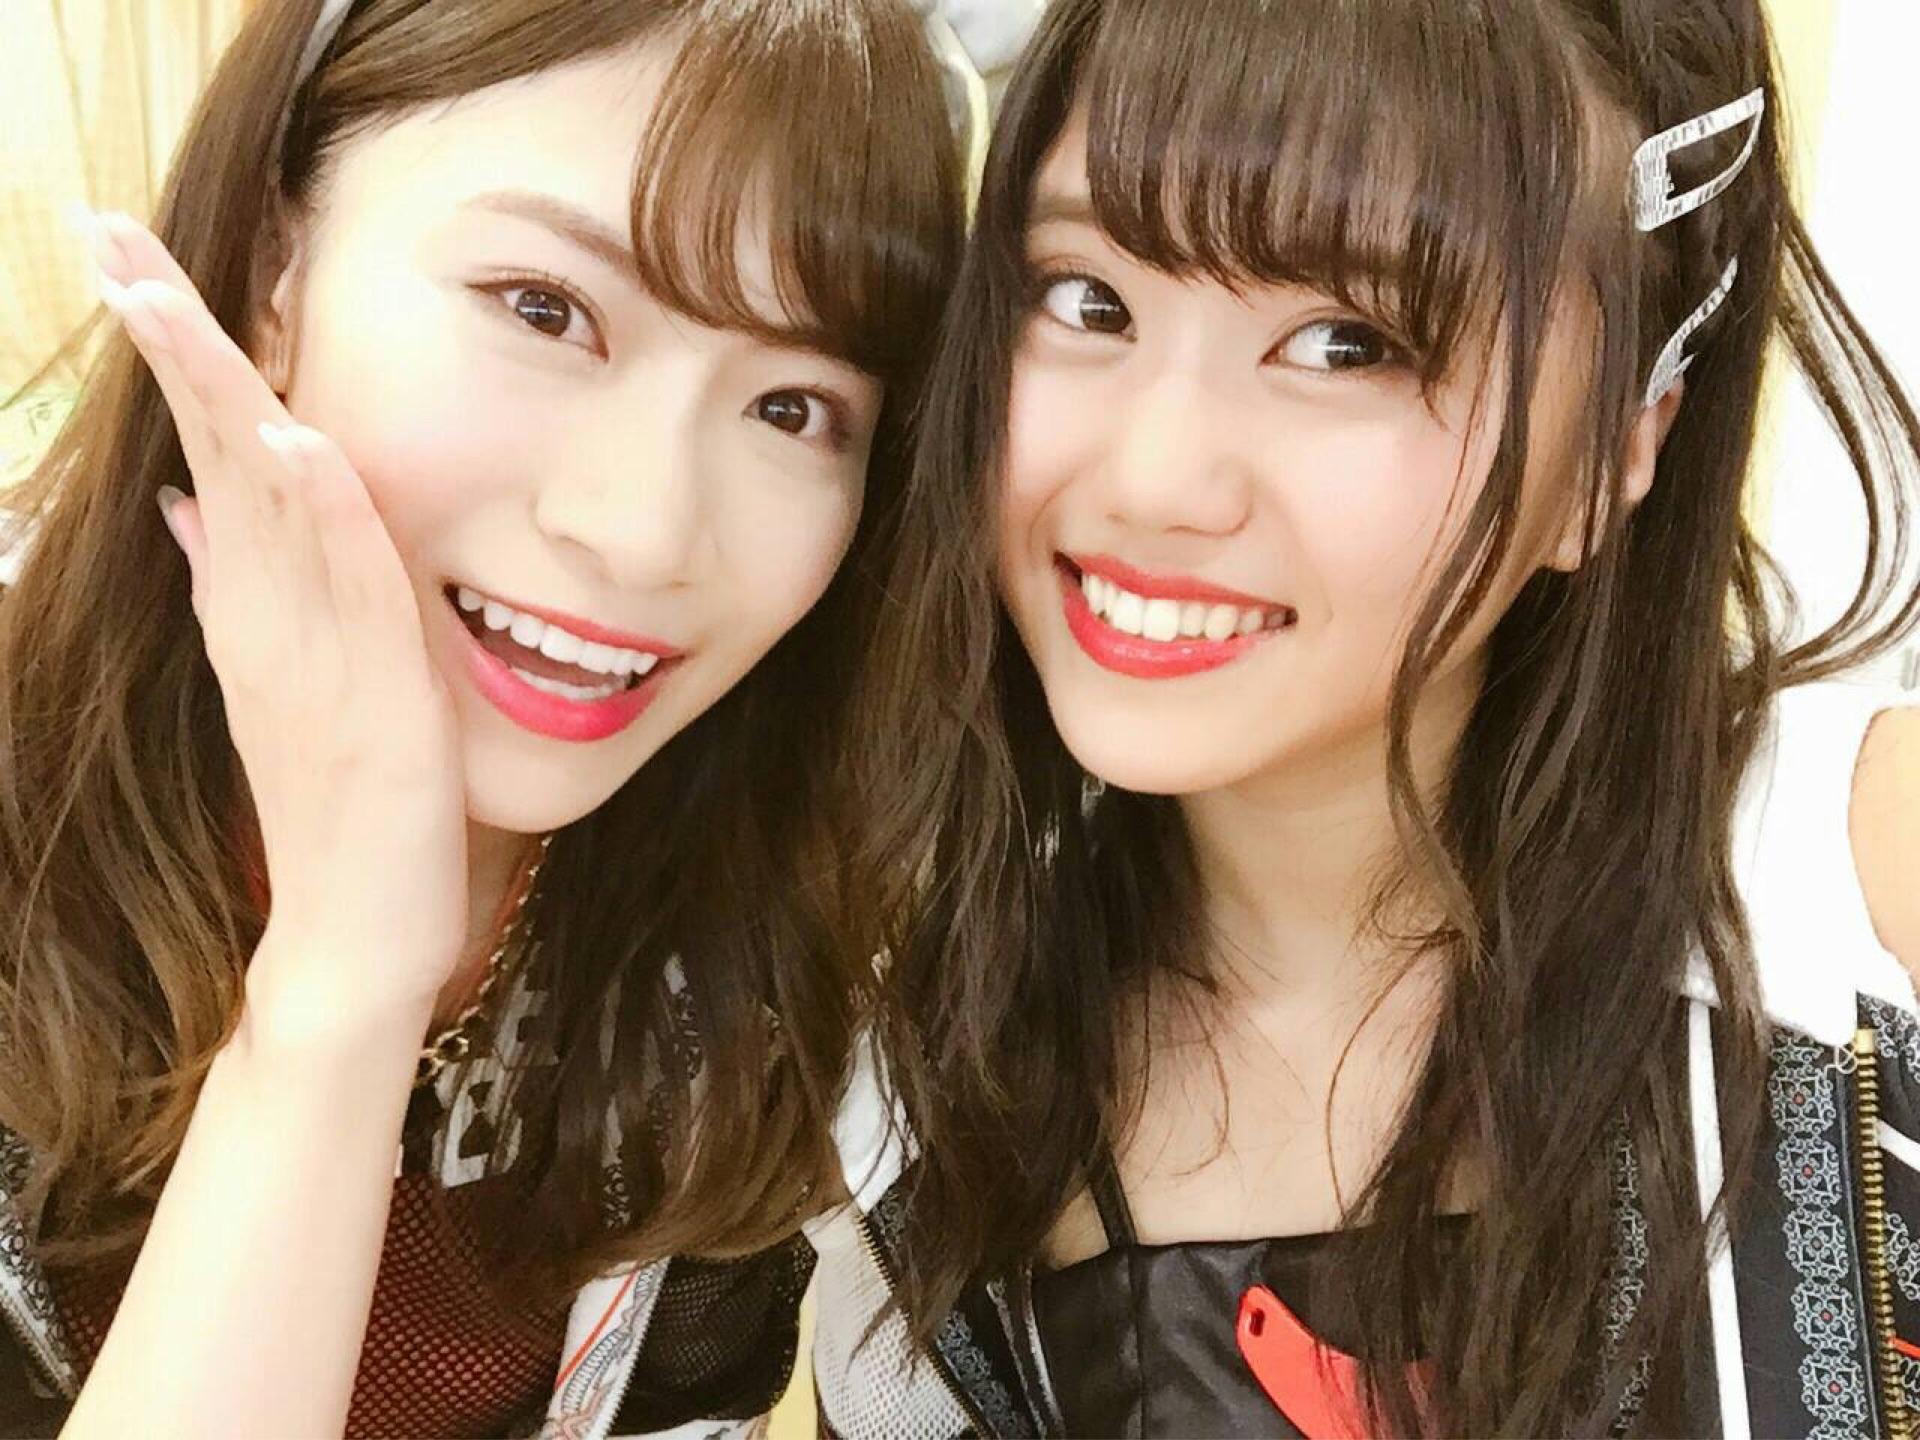 【SKE48】後藤理沙子、卒業を発表 小学生から大学生まで8年間活動「SKEは私の青春でした」 YouTube動画>1本 ->画像>112枚